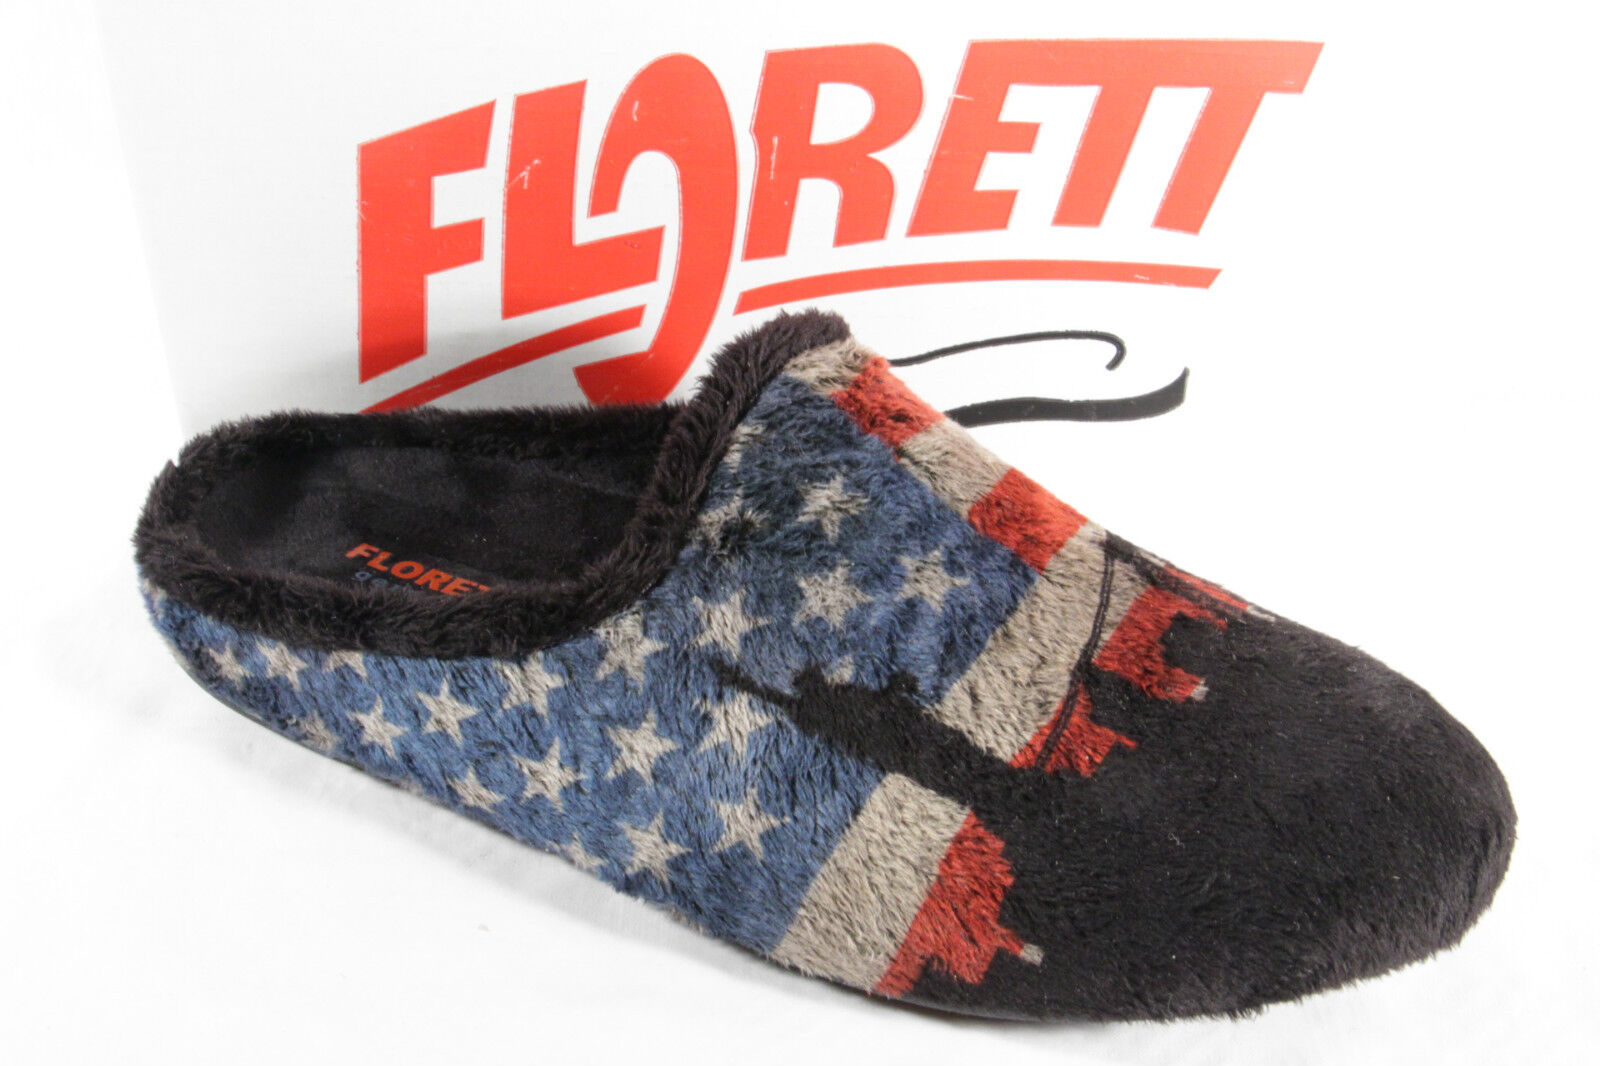 Pantofole da uomo Florett Uomo Pantofola Pantofole PANTOFOLE CIABATTE PANTOFOLE NUOVO